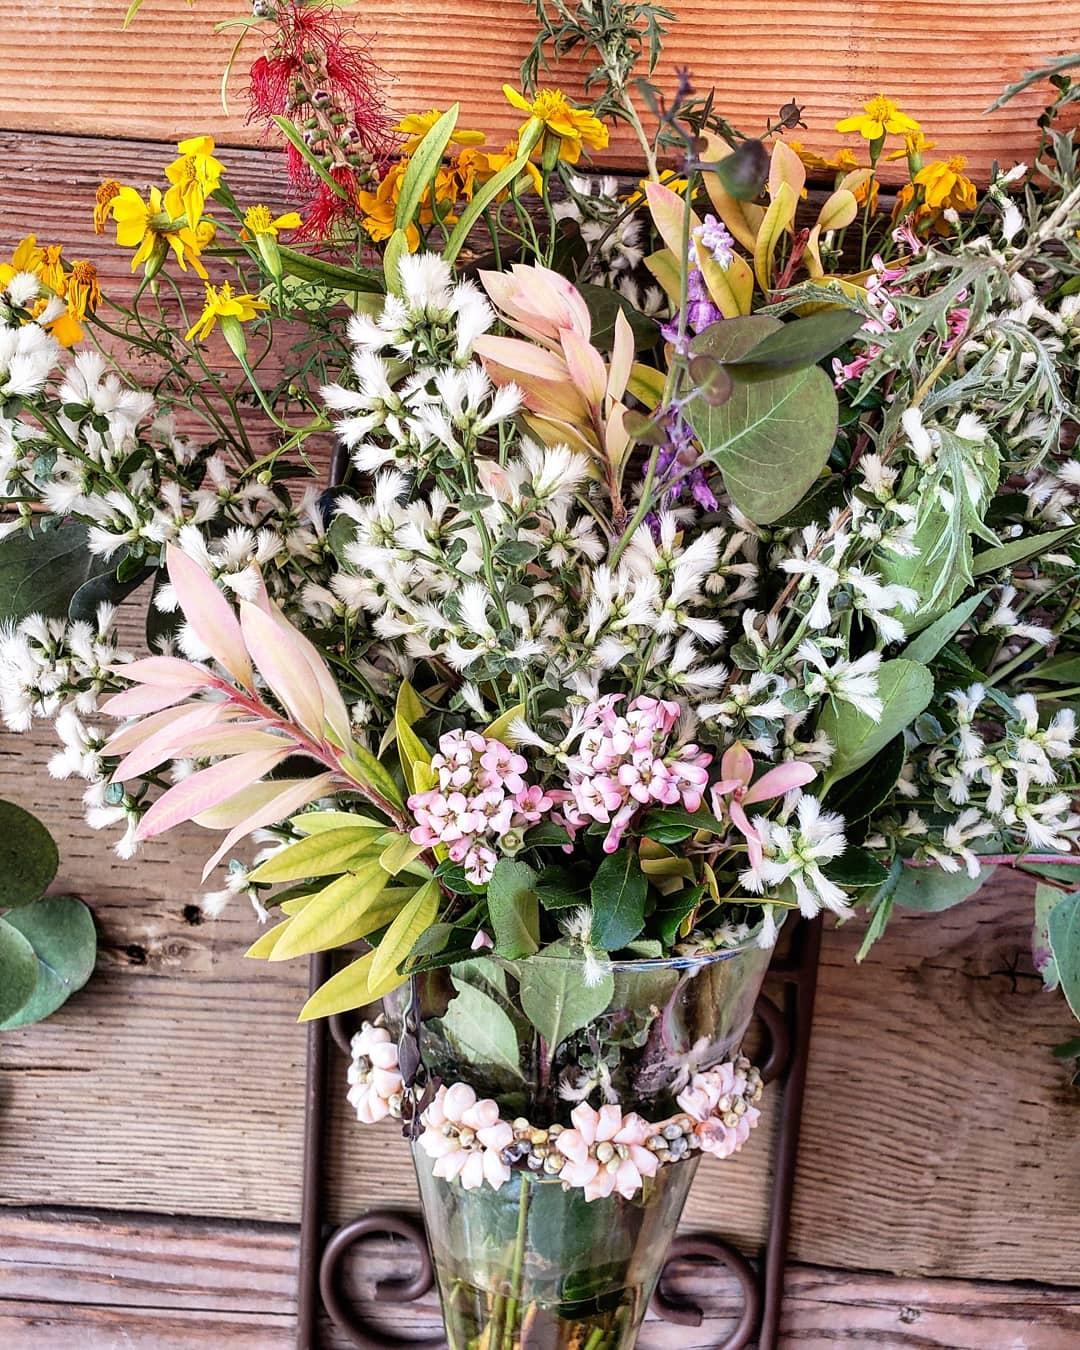 Los-alamos-hipcamp-flowers